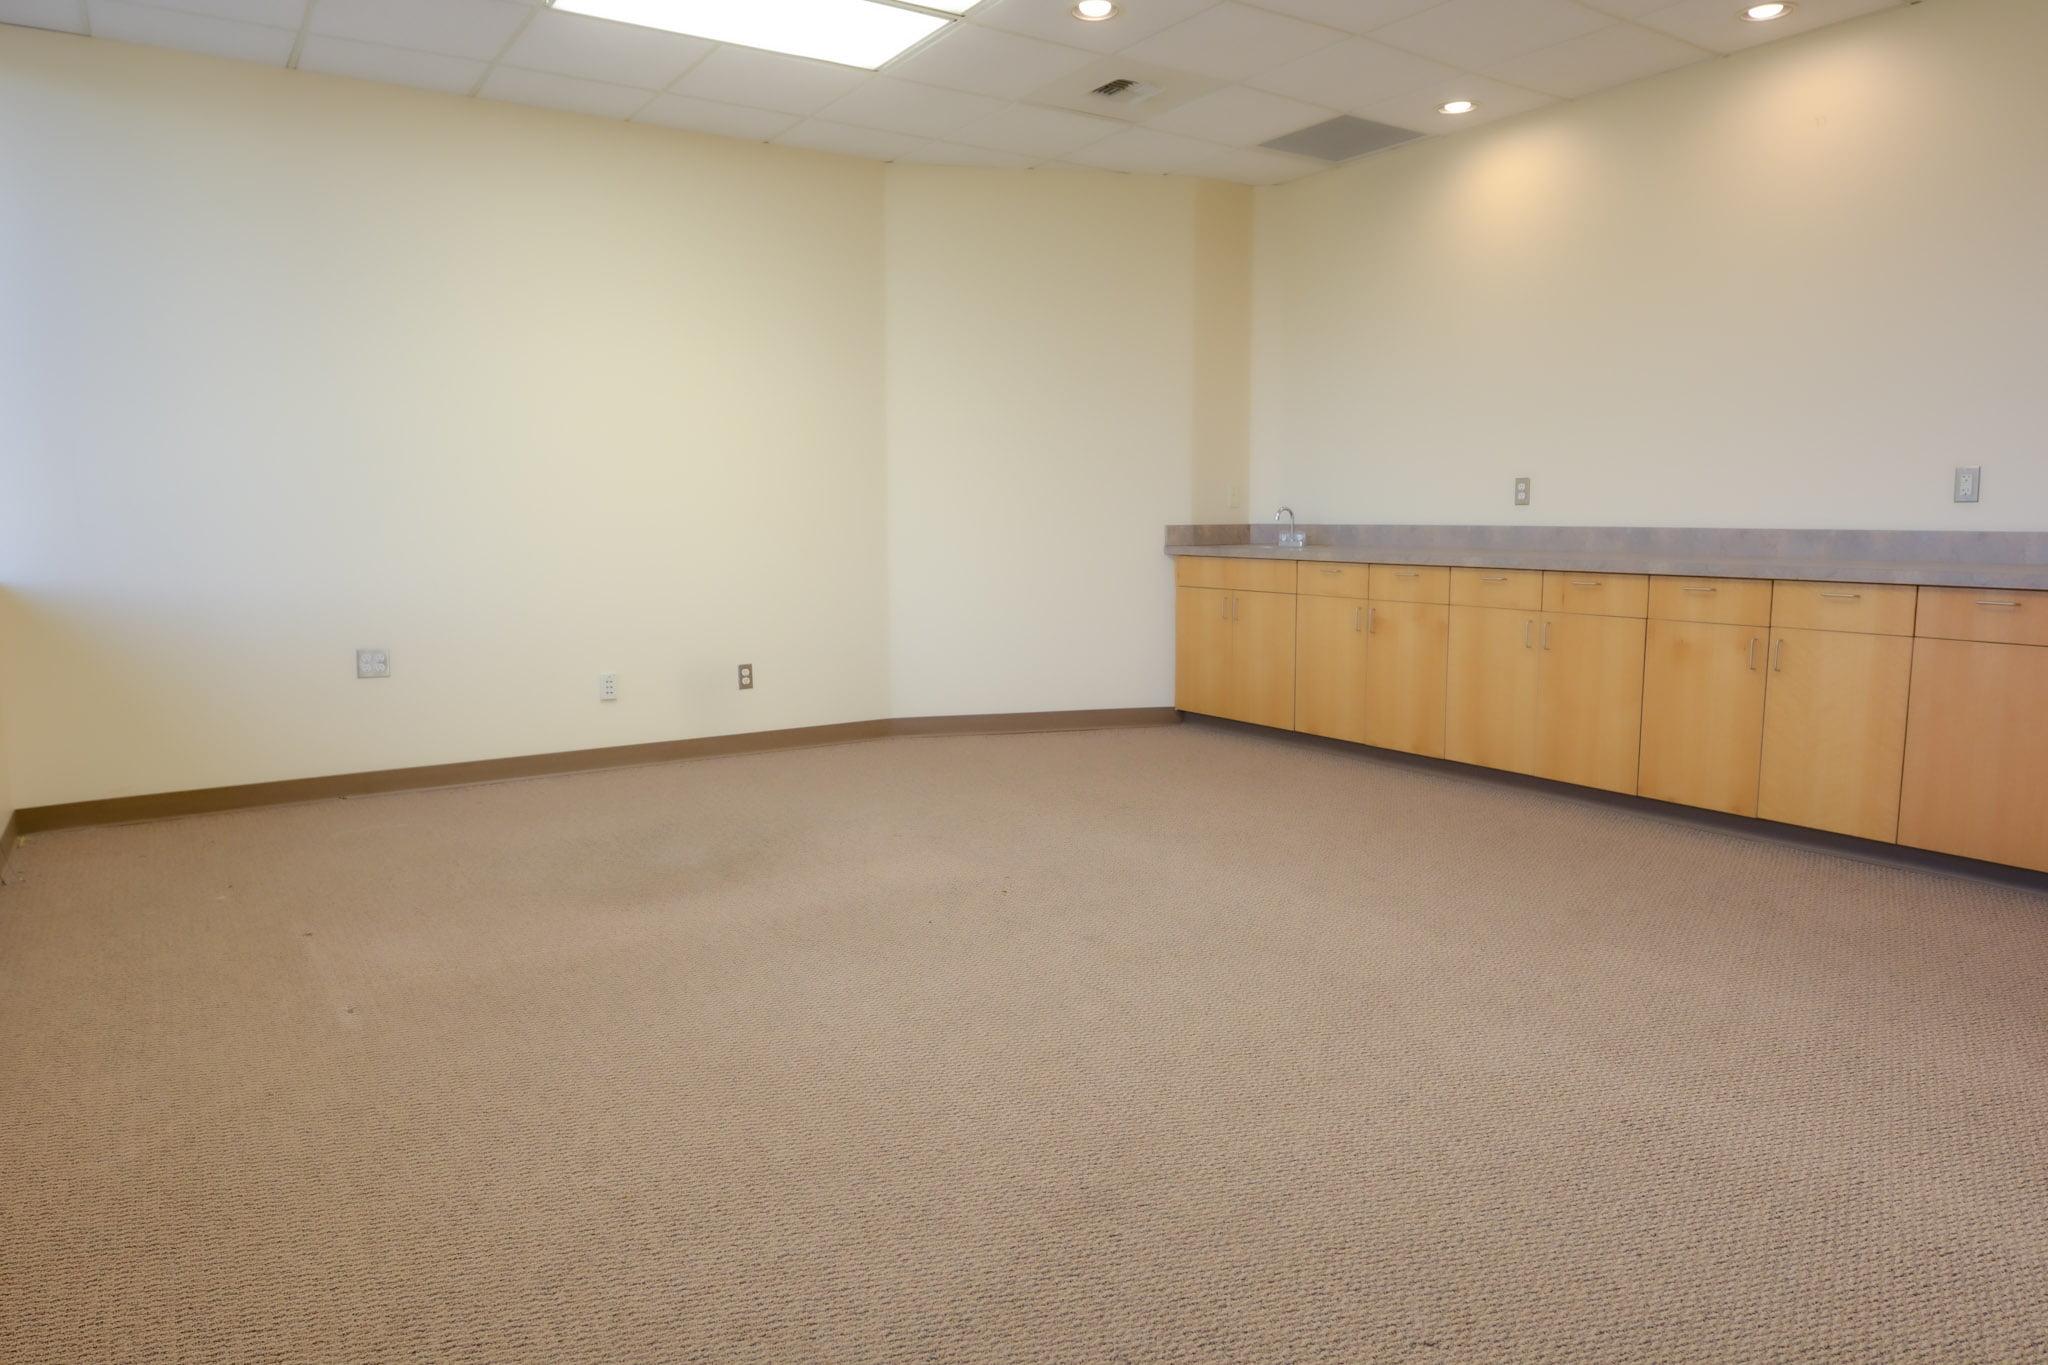 3003 Minnesota Drive - Suite-201 - 20